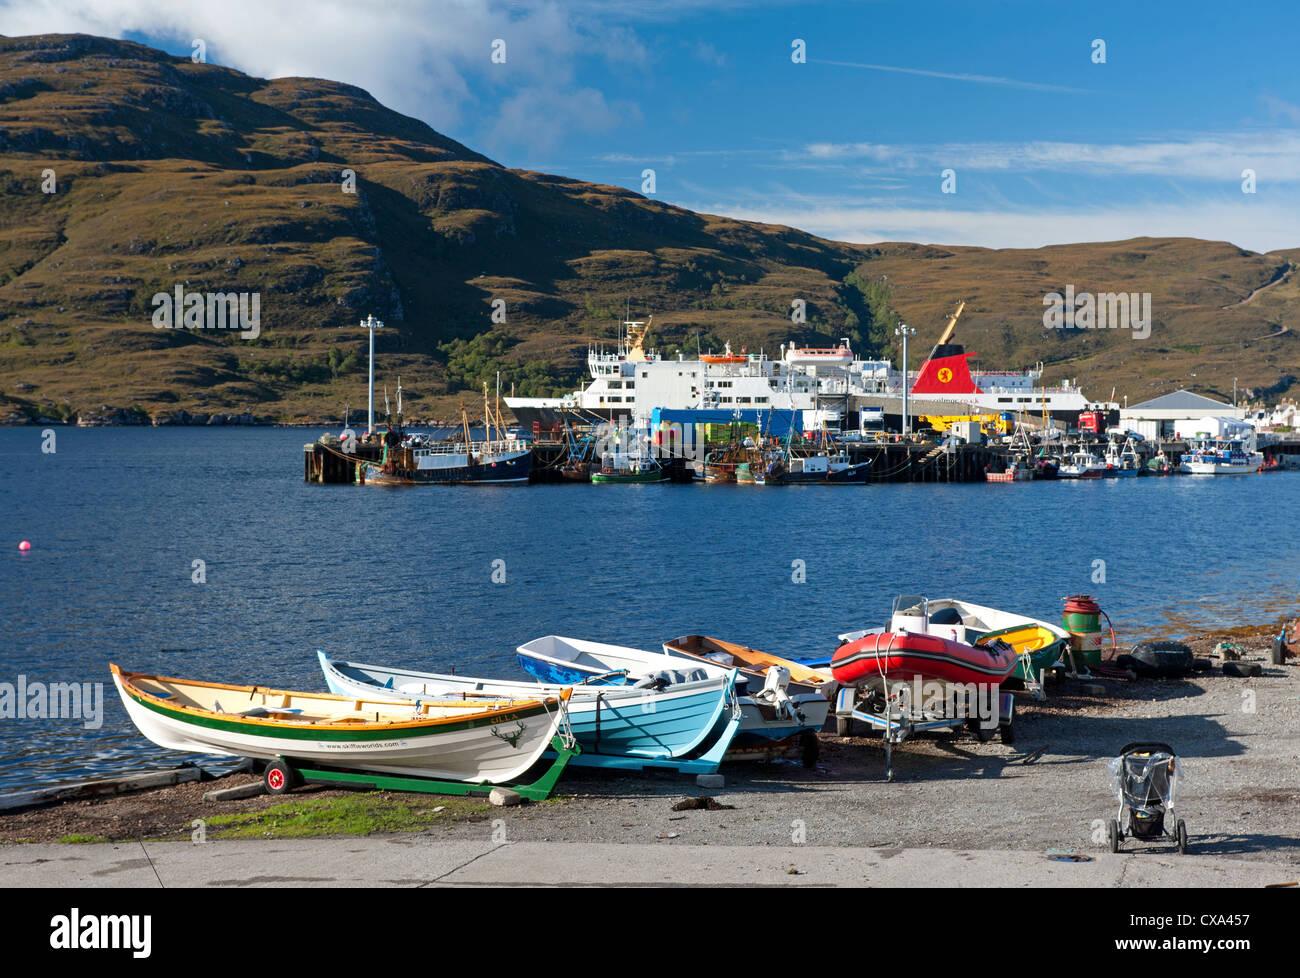 Ullapool, fishing and tourist ferry port on Loch Broom, Wester Ross Highland Region Scotland.   SCO 8534 - Stock Image